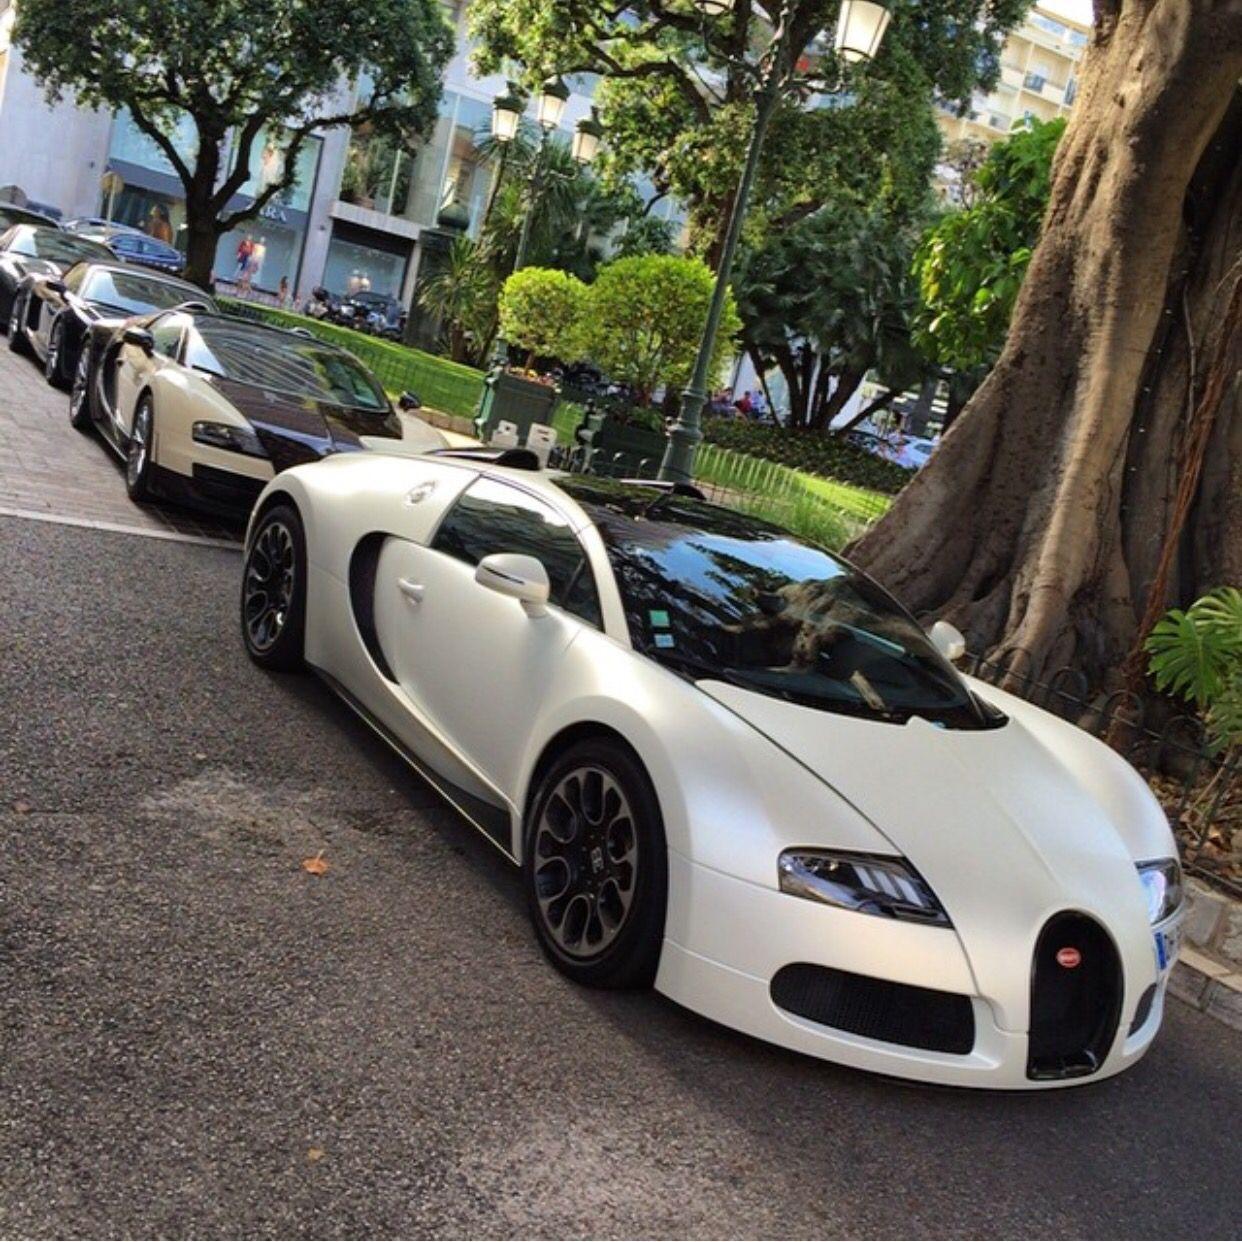 Bugatti Veyron Grand Sport Sang Blanc Painted In White A